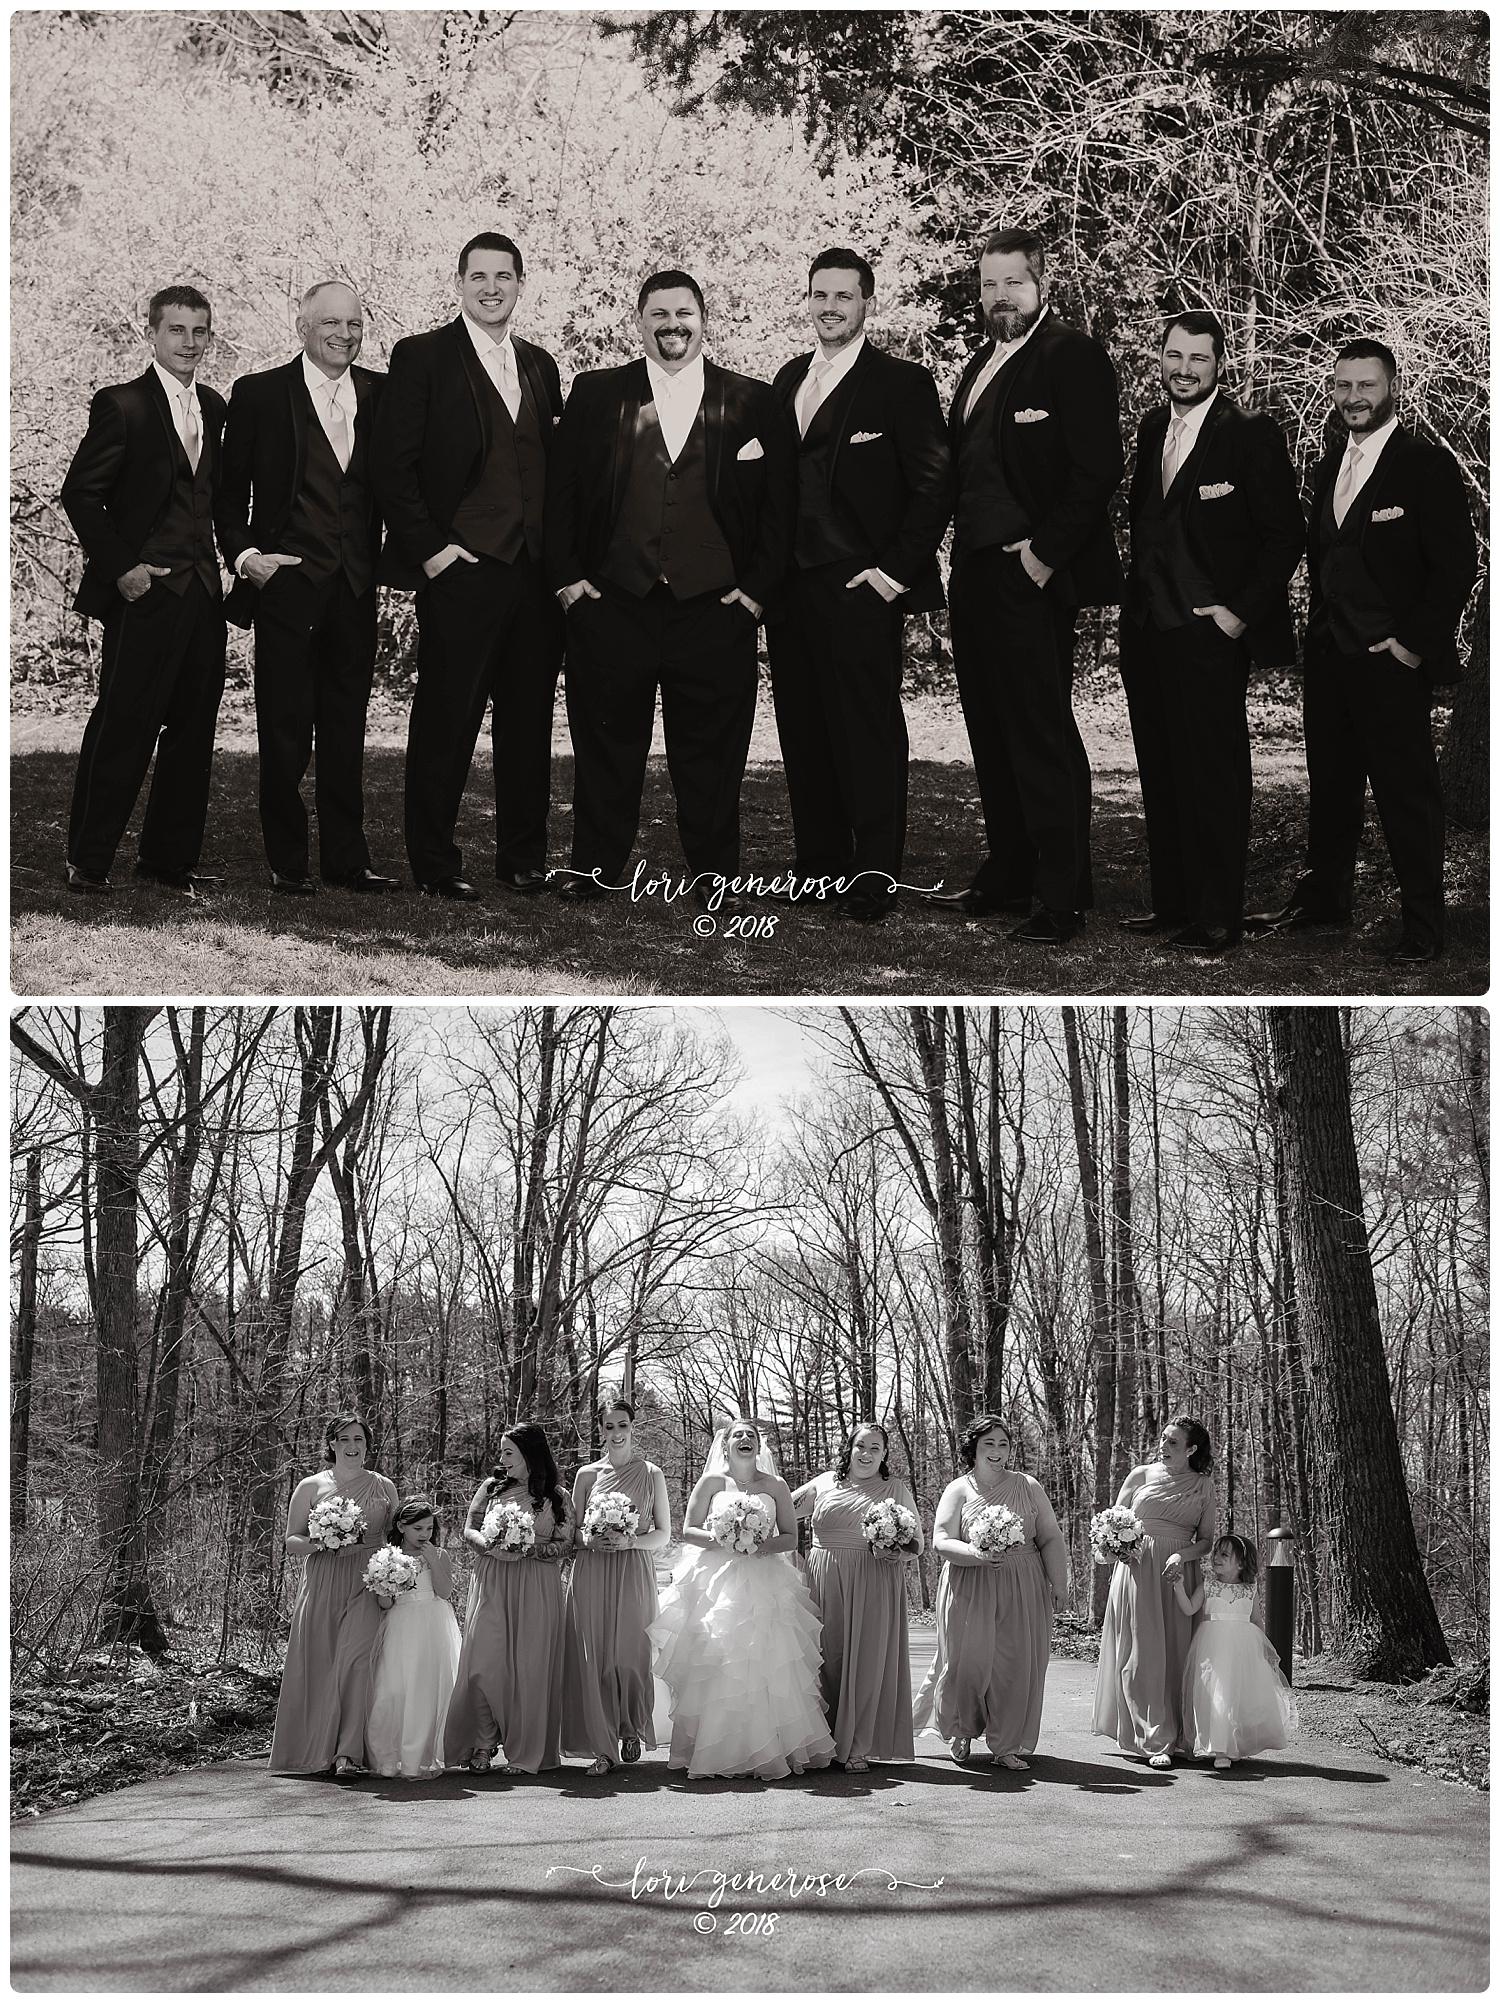 groomsmenandbridesmaidswalkingblackandwhitelgphotography.jpg